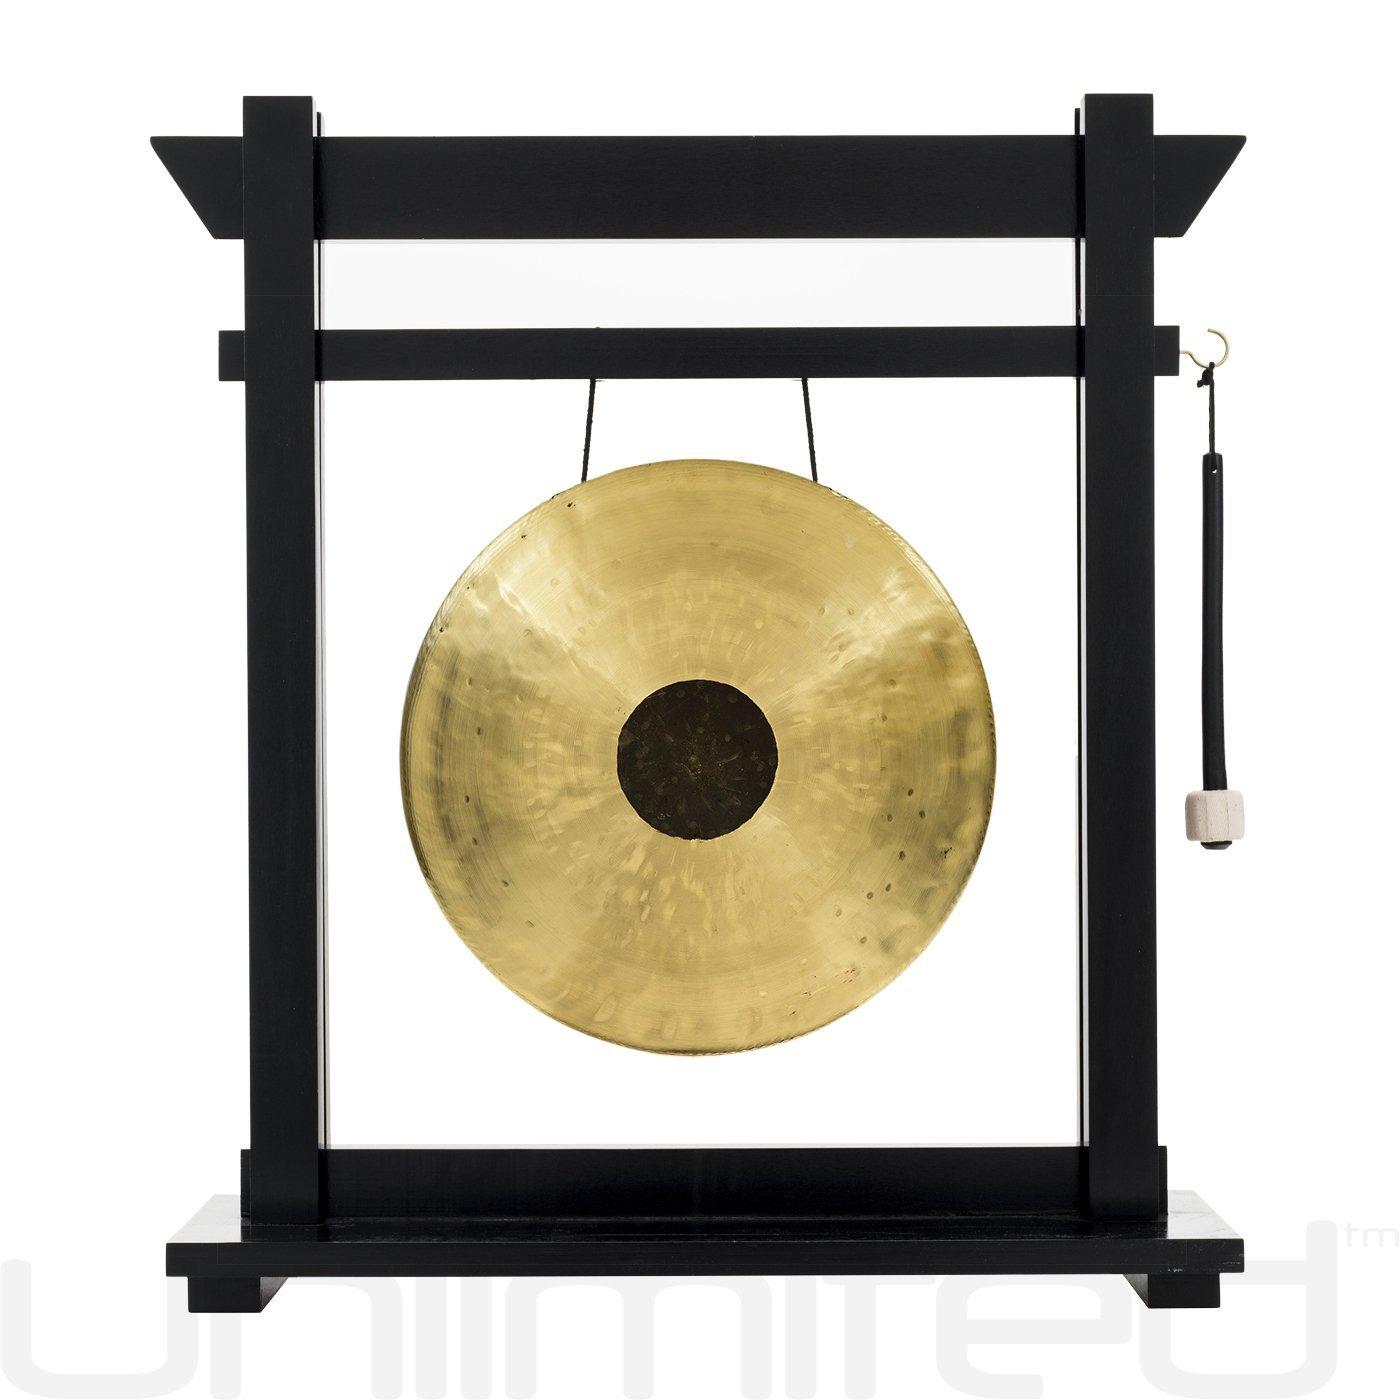 14'' Gongs on the Moksha Joe Gong Stand - Black by Unlimited